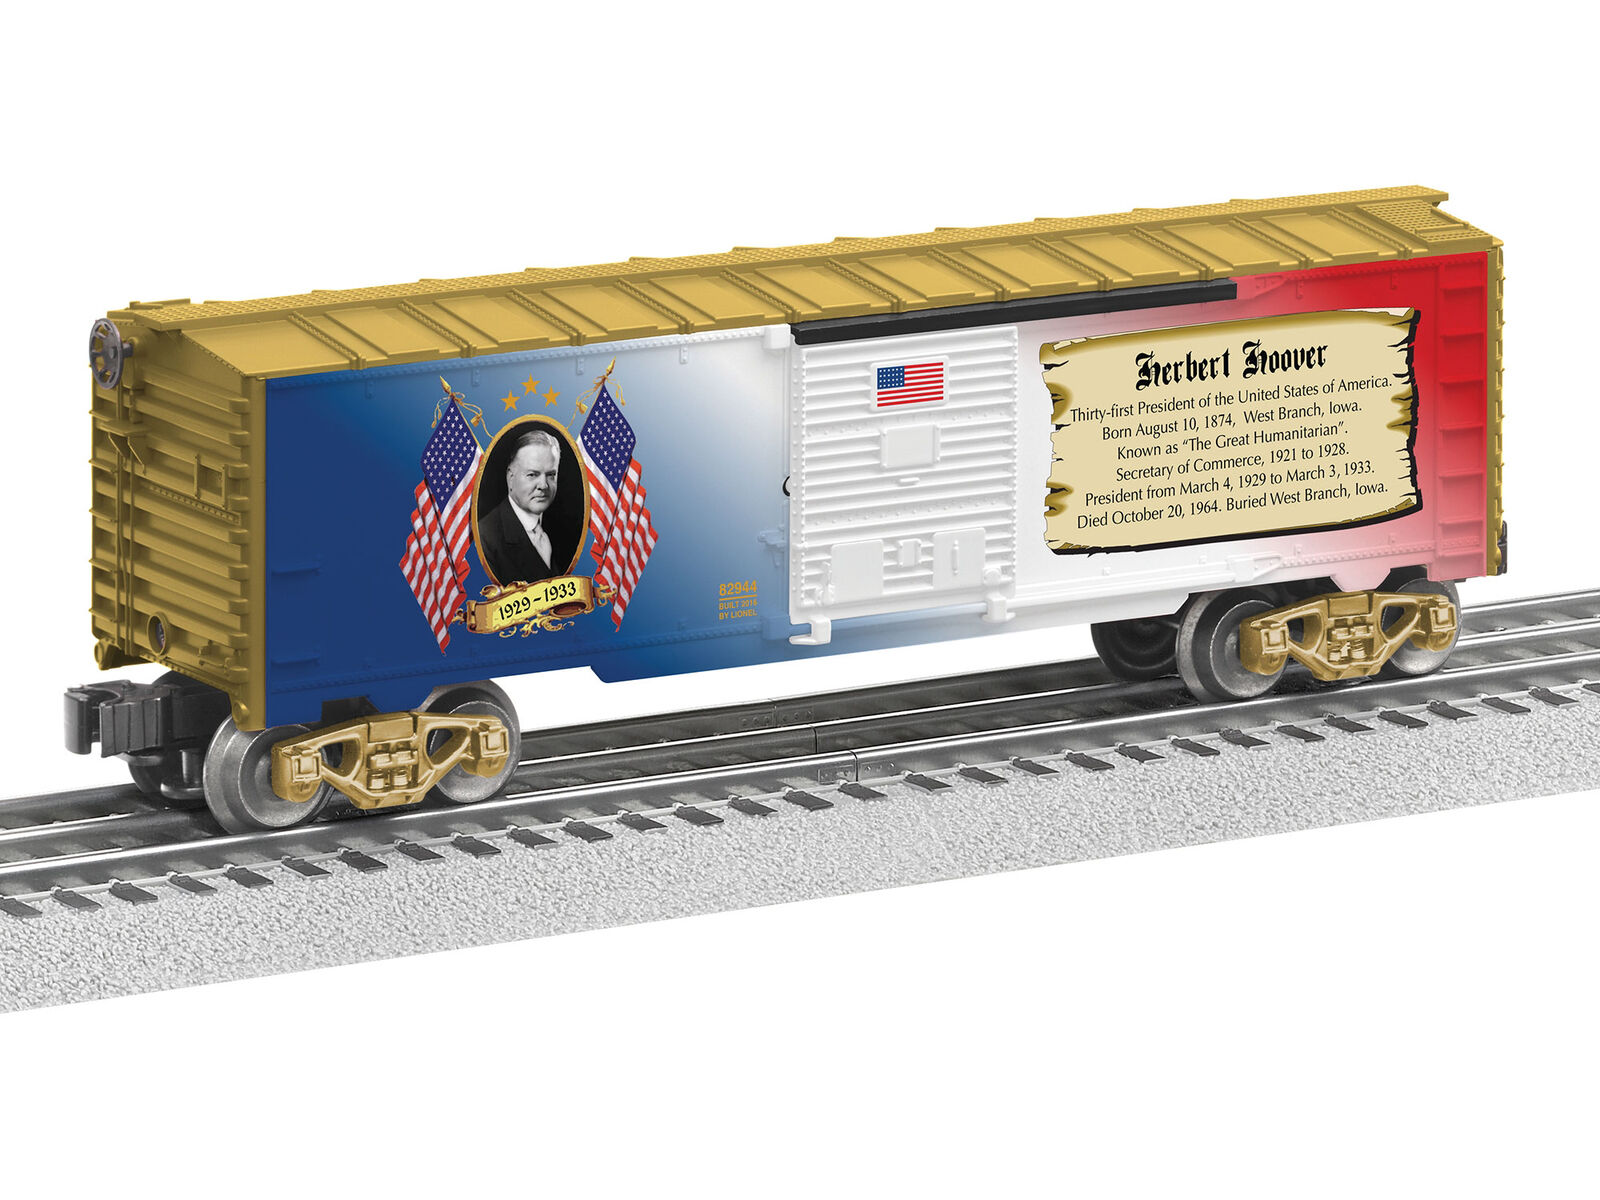 Lionel 6-82944 Presidential Series Herbert Hoover scatola auto O O O Gauge modello i treni 347cc0